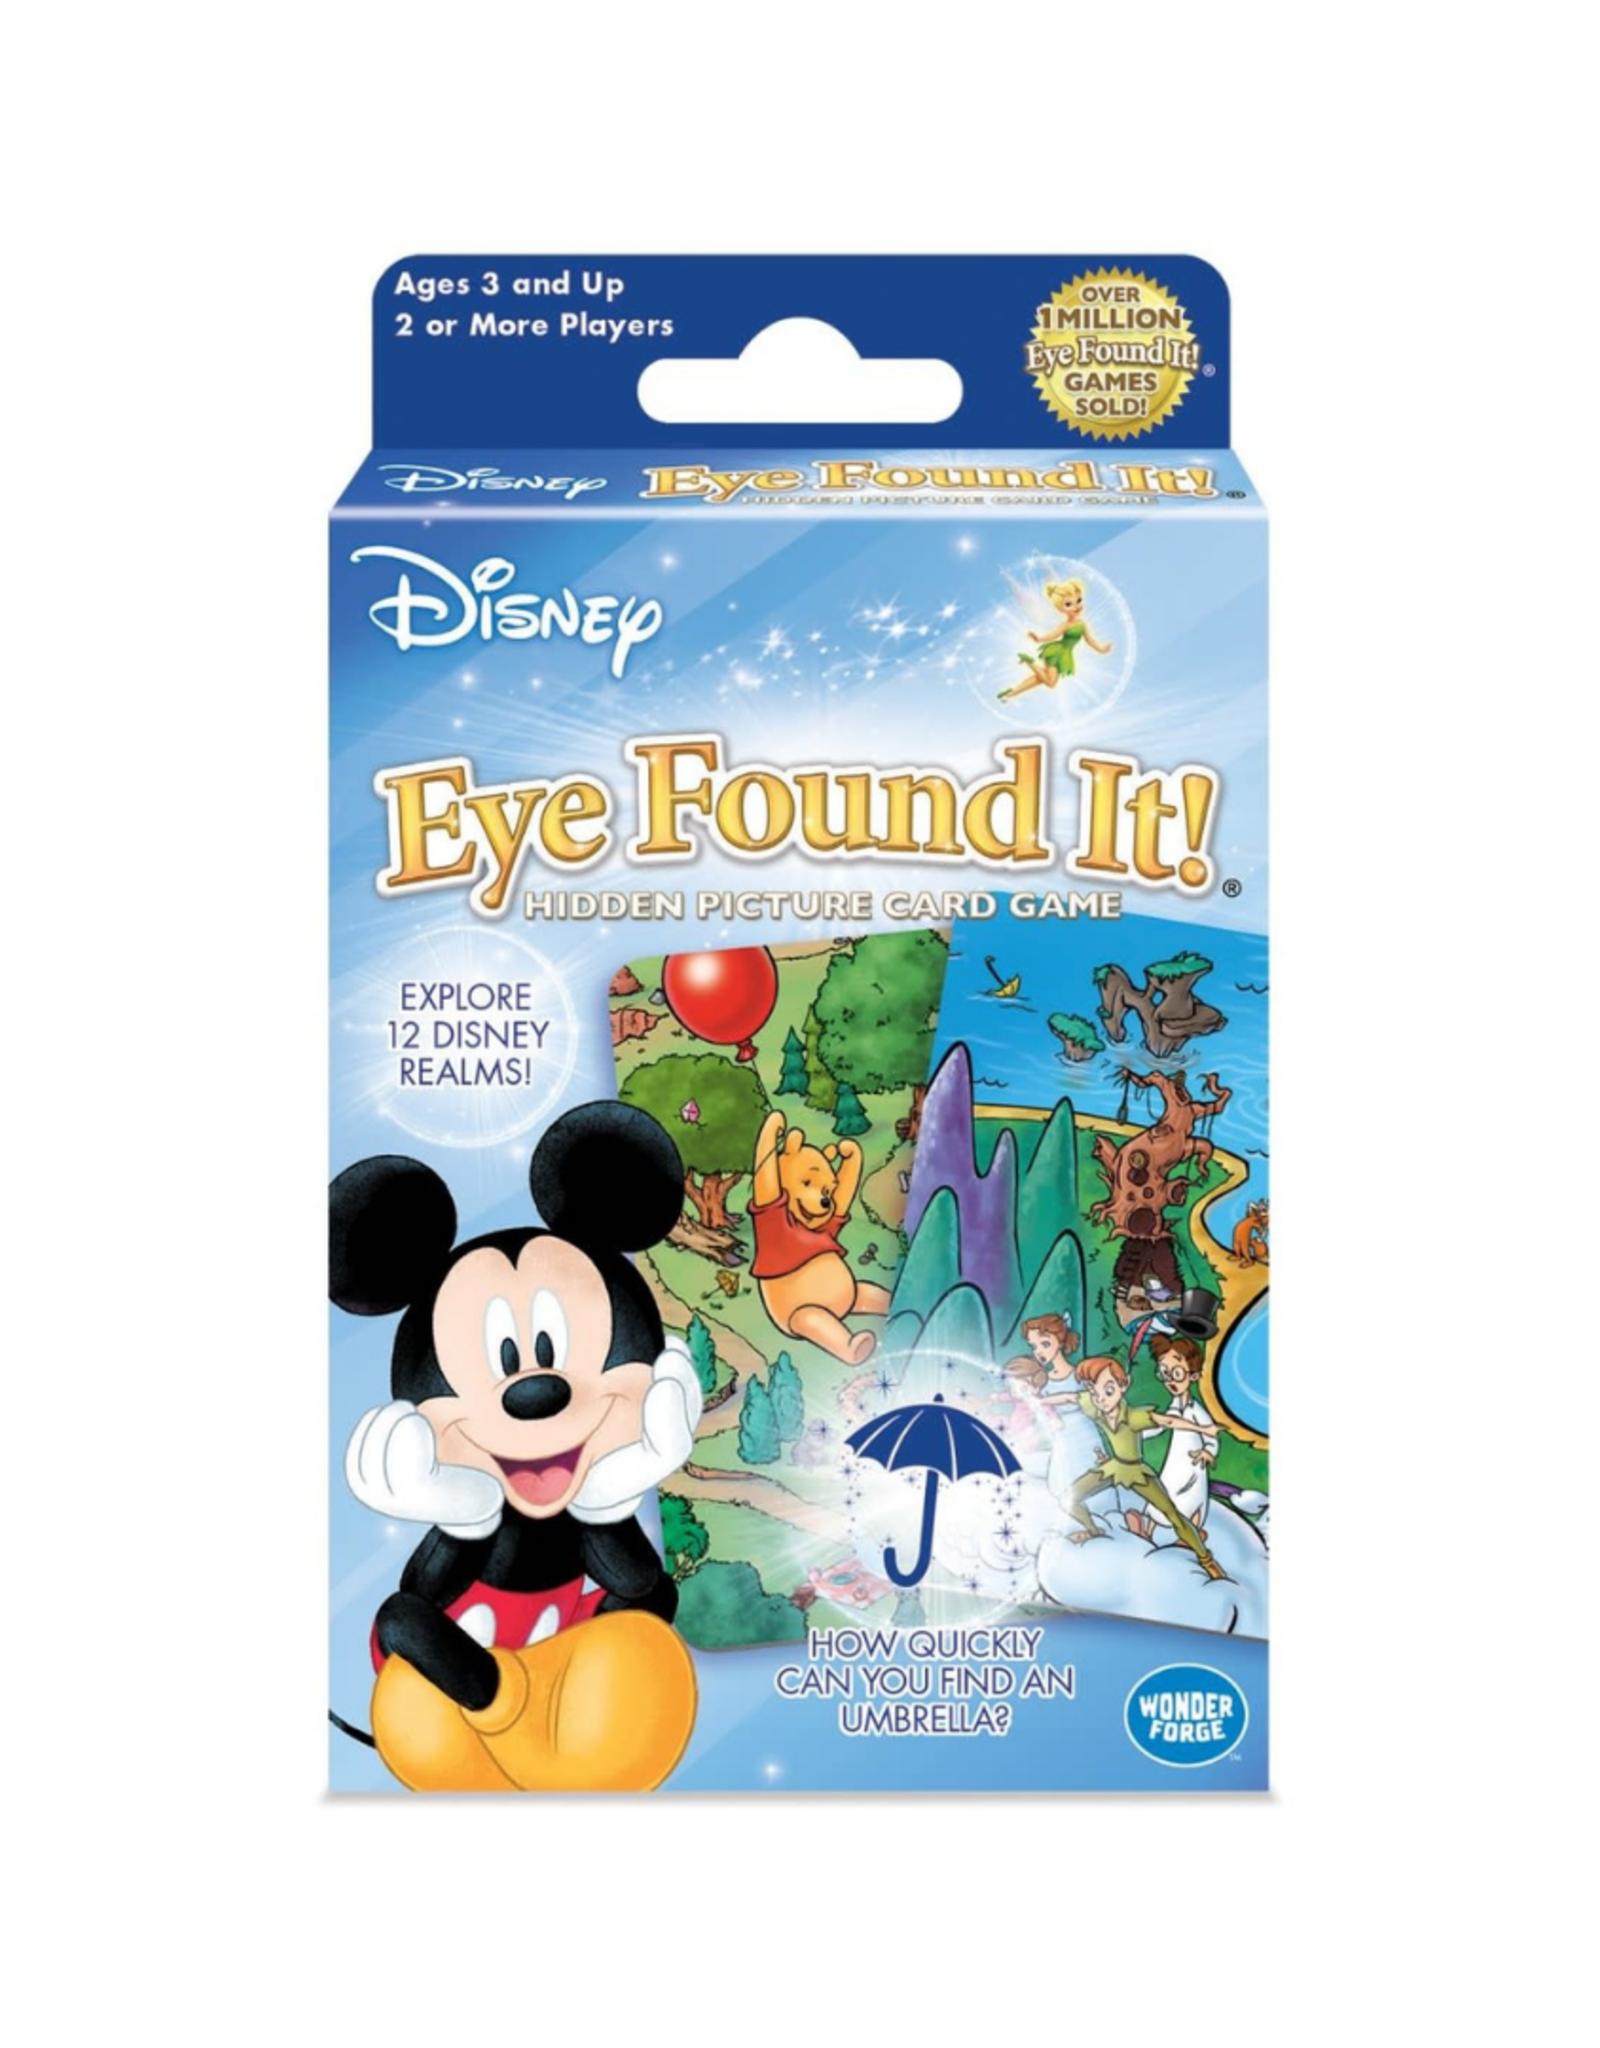 Ravensburger Disney Eye Found It! Card Game